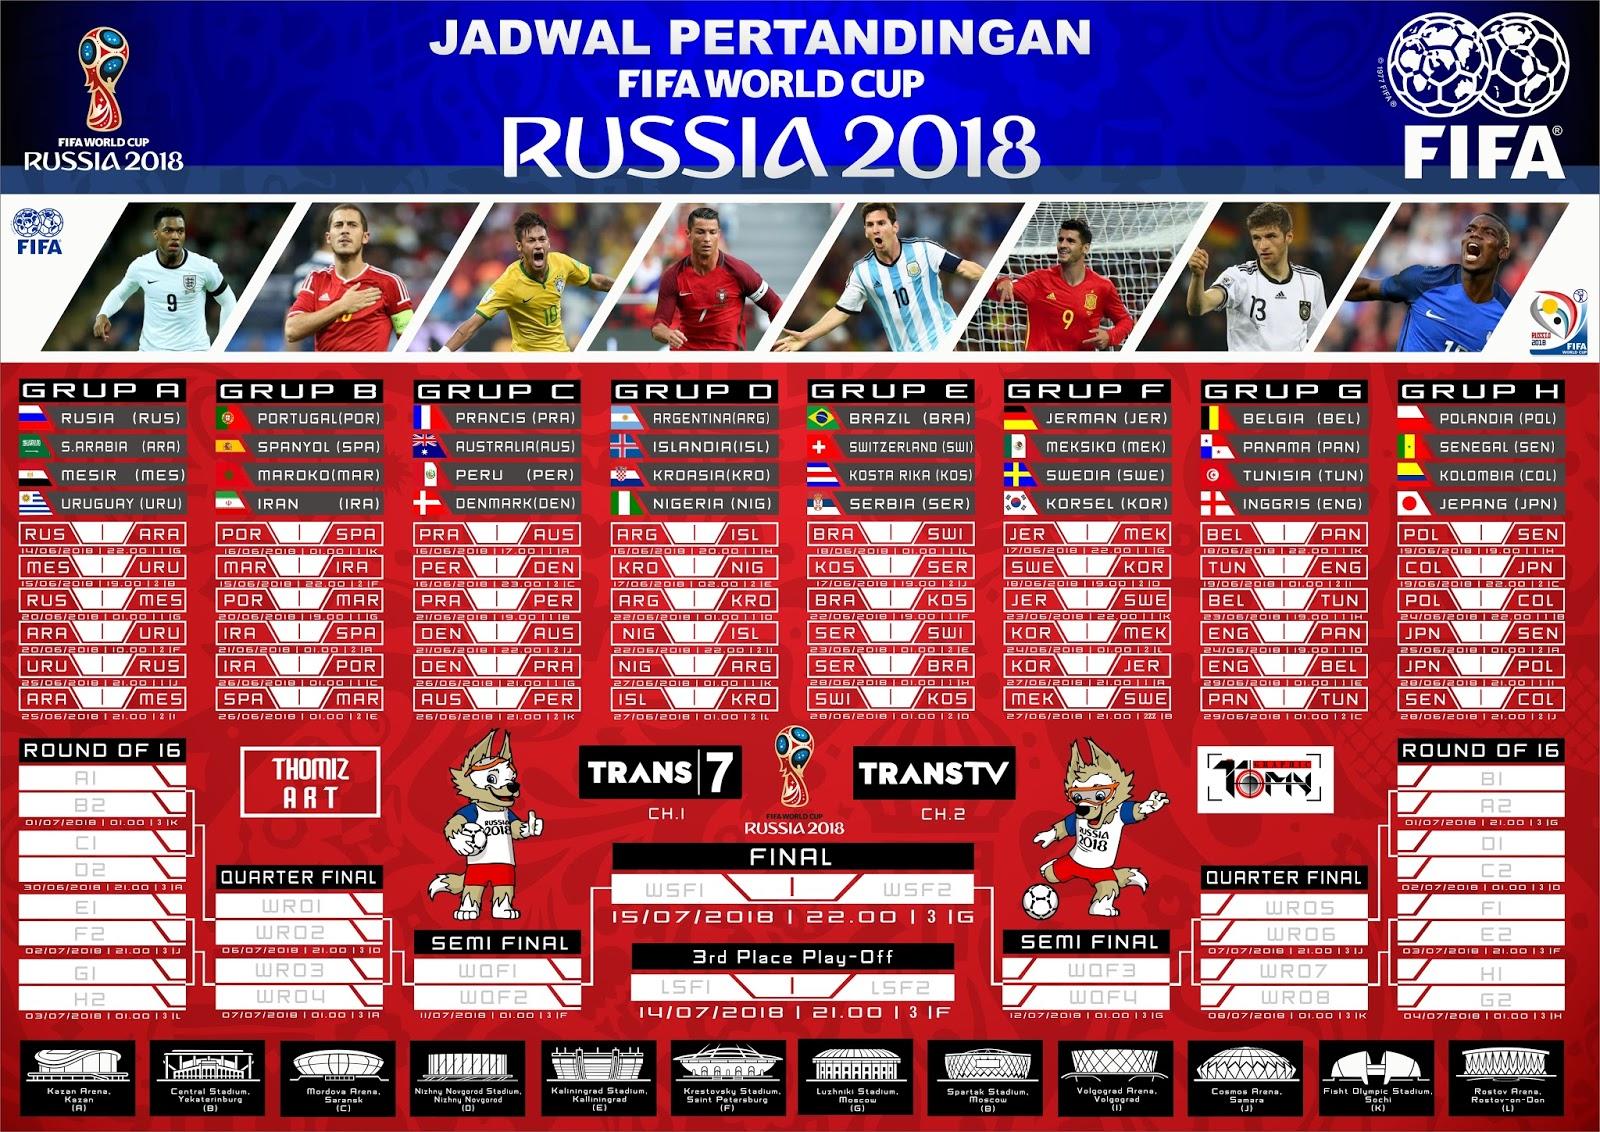 Cool Final World Cup 2018 - Jadwal%2BPiala%2Bdunia%2B%2Brussia%2B2018%2BSchedule%2BFifa%2Bworldcup%2B2018%2BHASIL%2BSKEMA%2Bwaktu%2Bindonesia%2Bbarat%2Bwib%2Brusia%2Bskema%2Btrans7%2Btranstv%2Btrans%2Bhasil%2Bdrawing%2Bundian%2Bpengundian%2B2017%2Bhak%2Bsiar%2Bgrup%2Bstadion%2Blengkap%2Bpd2018%2Bwib%2Bwallchart%2Bvector%2Bcdr%2Bpsd  Collection_864899 .jpg